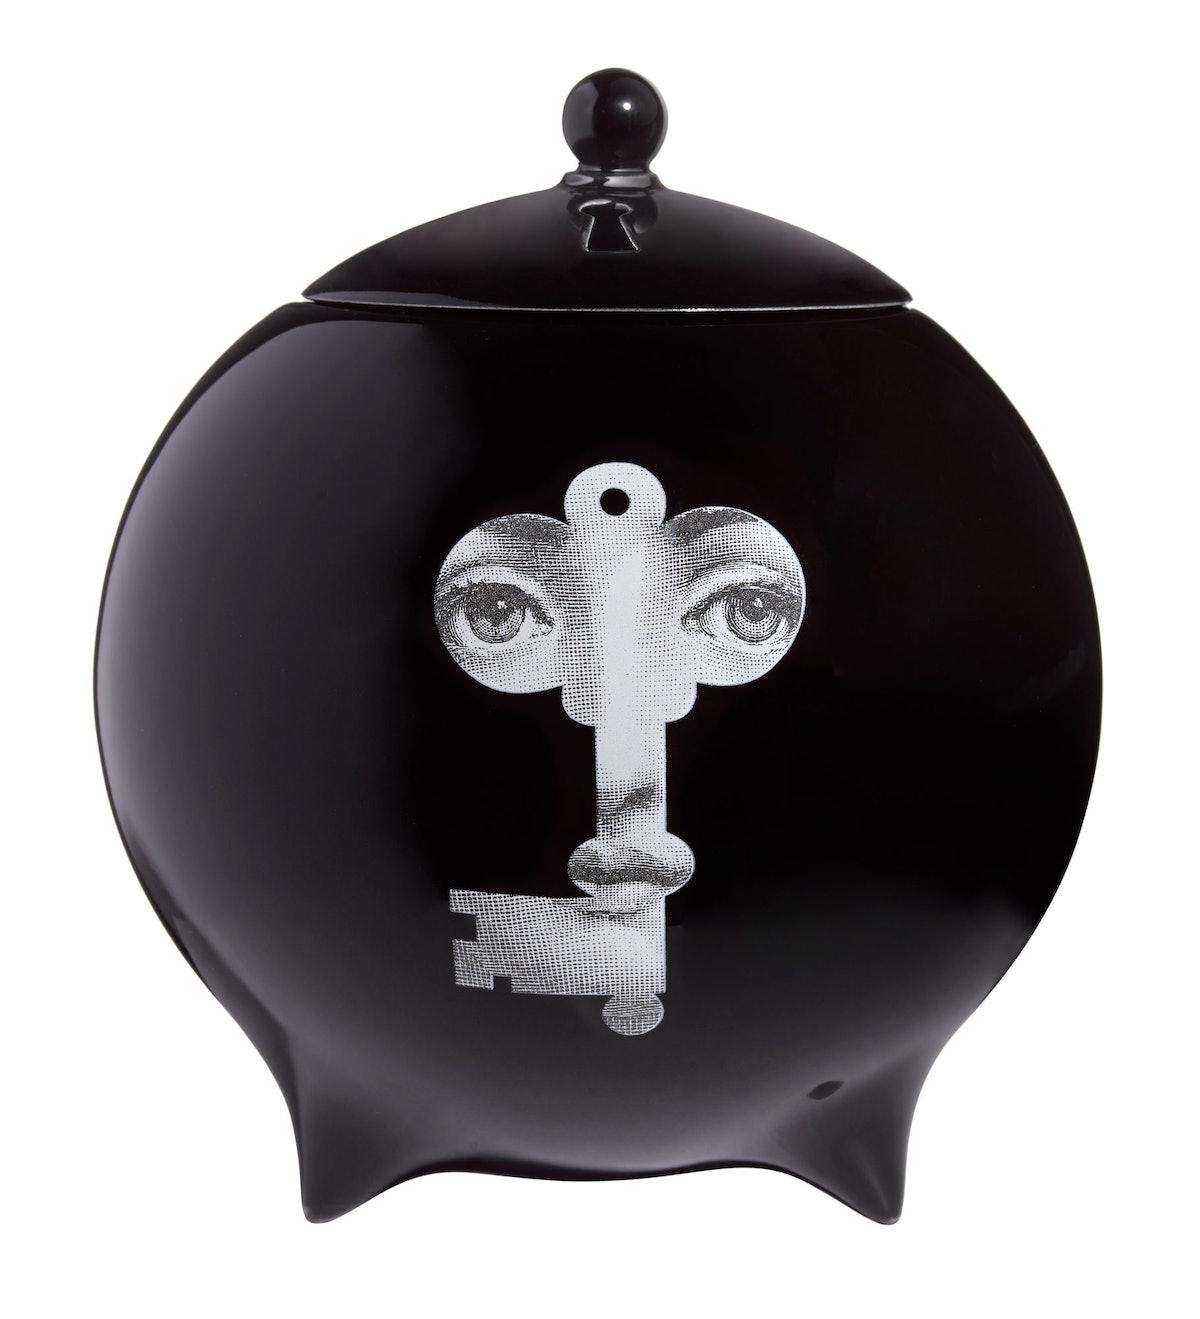 Fornasetti Profumi La Chiave Nero Scent Sphere, $350, [barneys.com](http://rstyle.me/n/d2ckj3w3n)